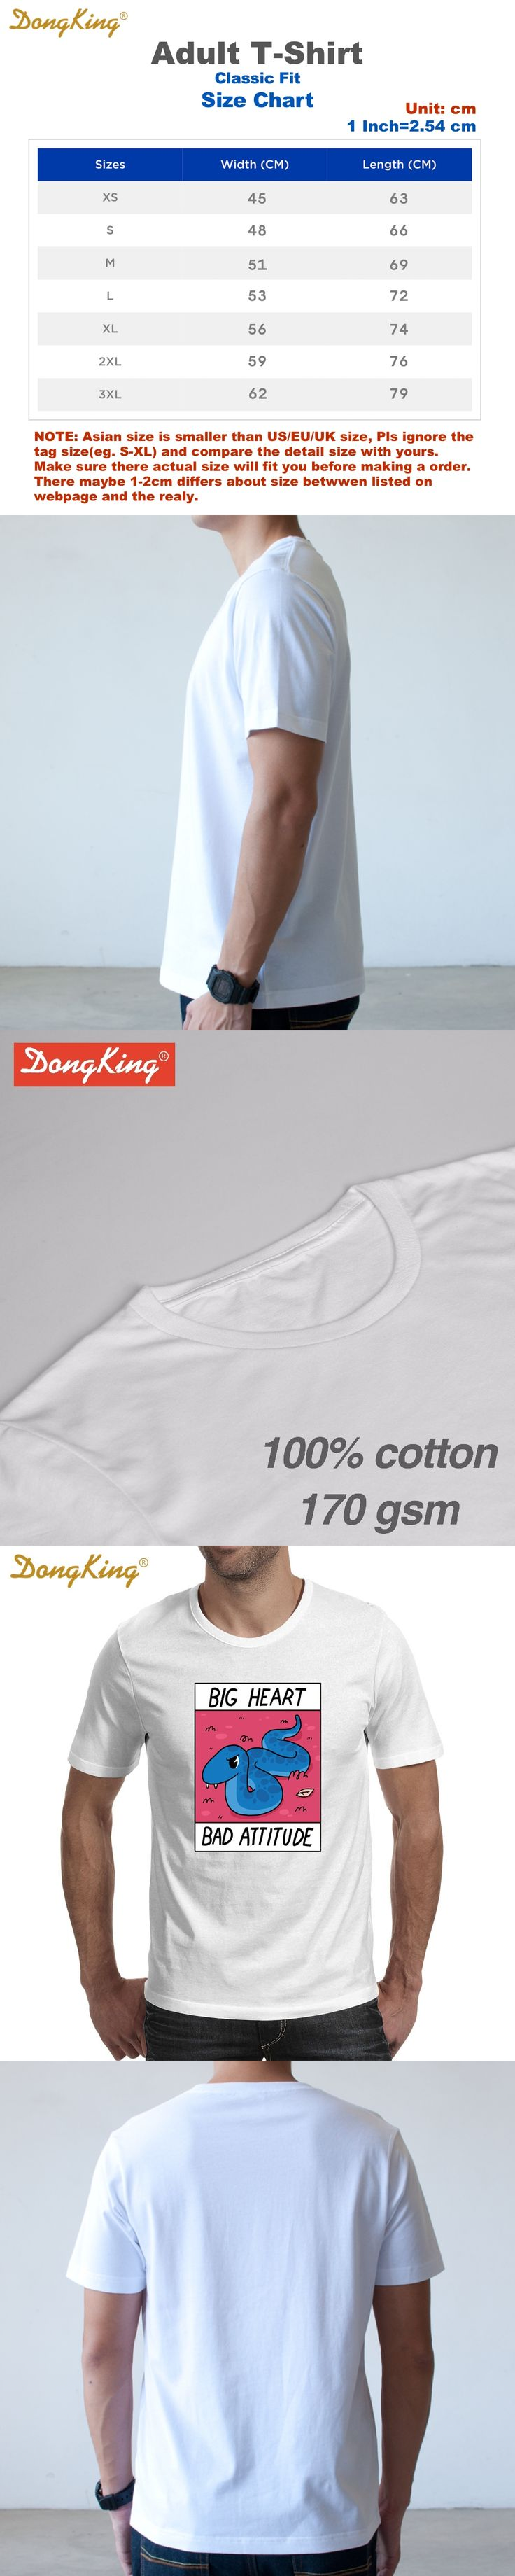 Newest Creative Design BIG HEART BAD ATTITUDE Printed T shirts Men's Women's Fashion Short Sleeve T-shirt Funny O-neck Cool Tee